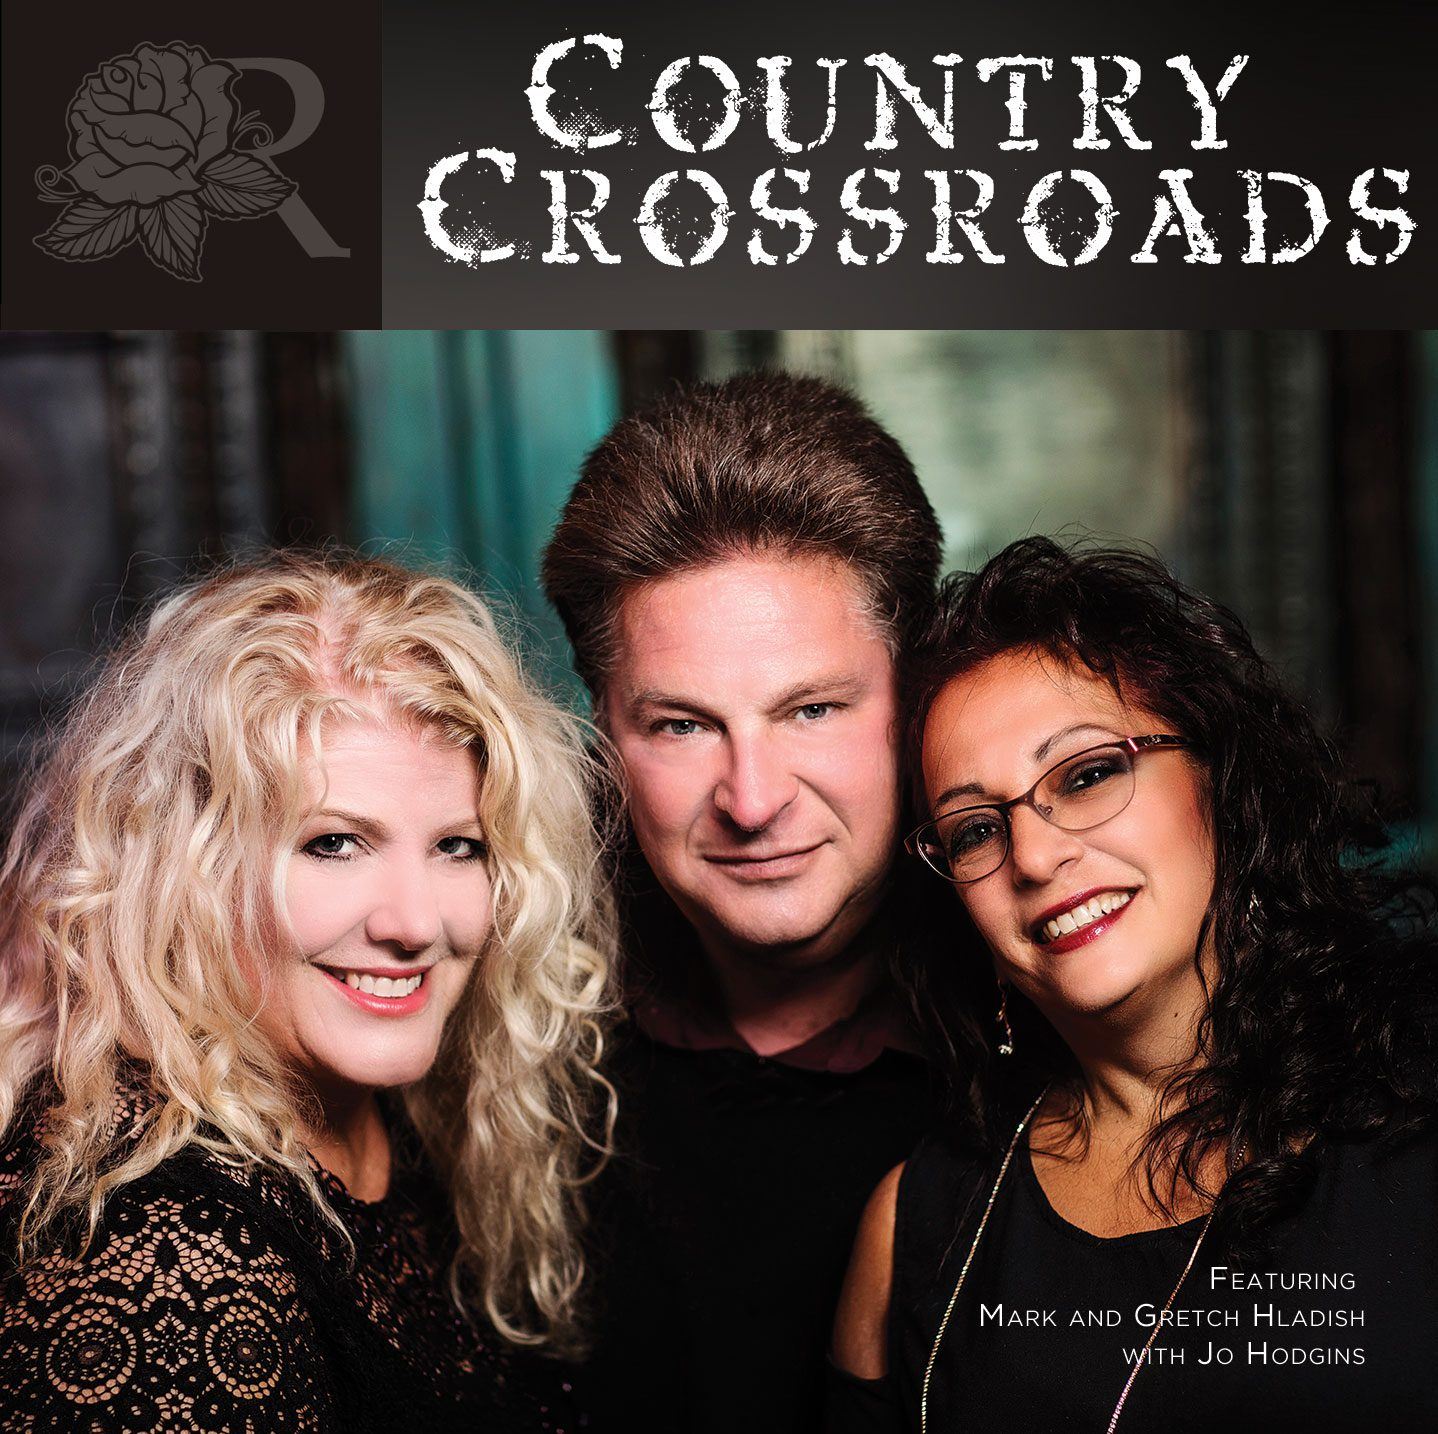 Country-Crossroads-Moc11